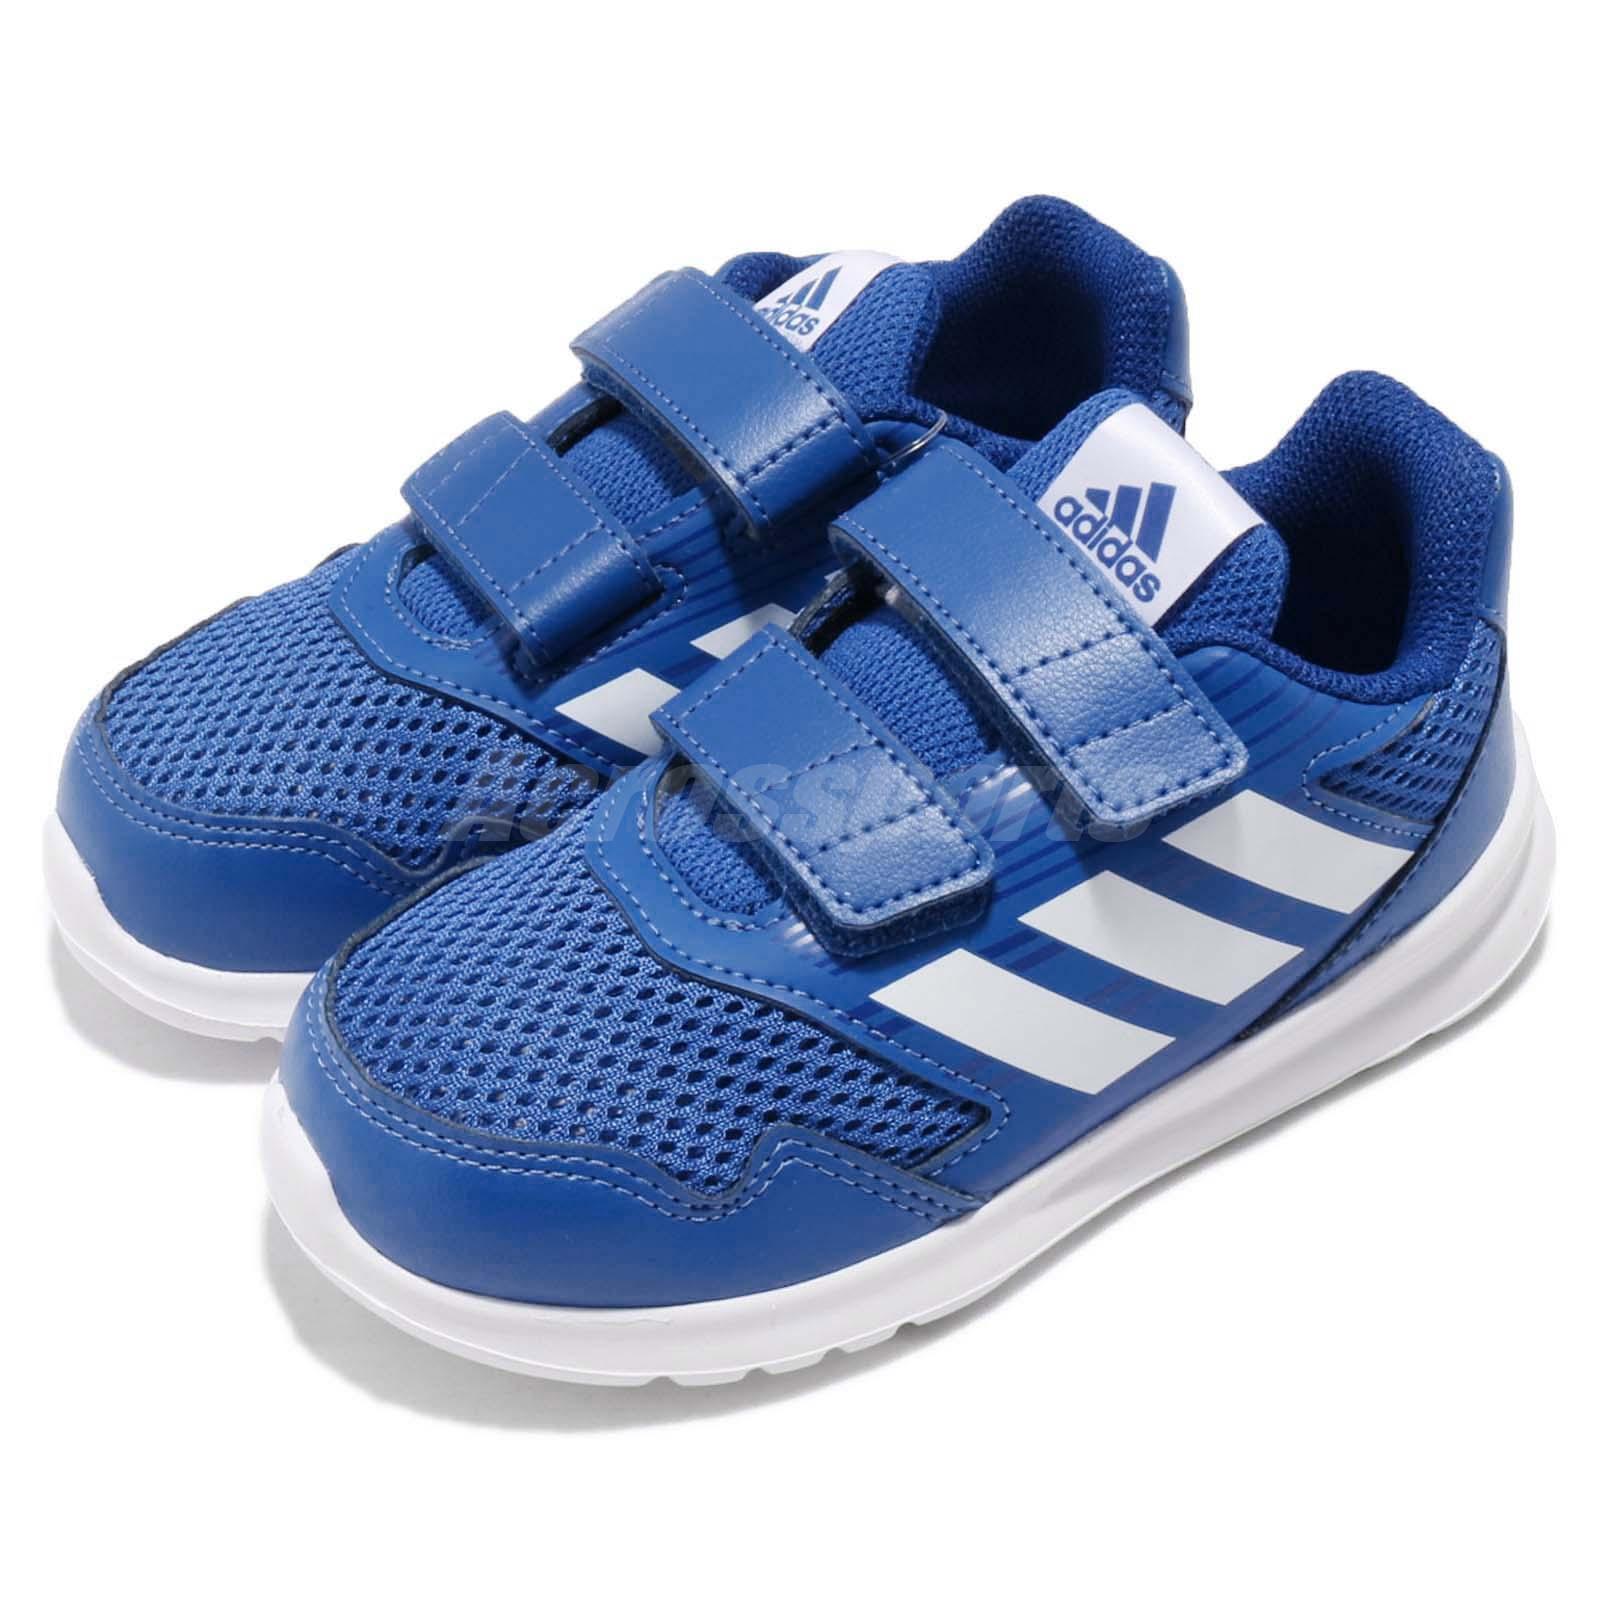 pretty nice de65e e4bd9 Details about adidas AltaRun CF I Cloudfoam Blue White Toddler Infant Running  Shoes CQ0028